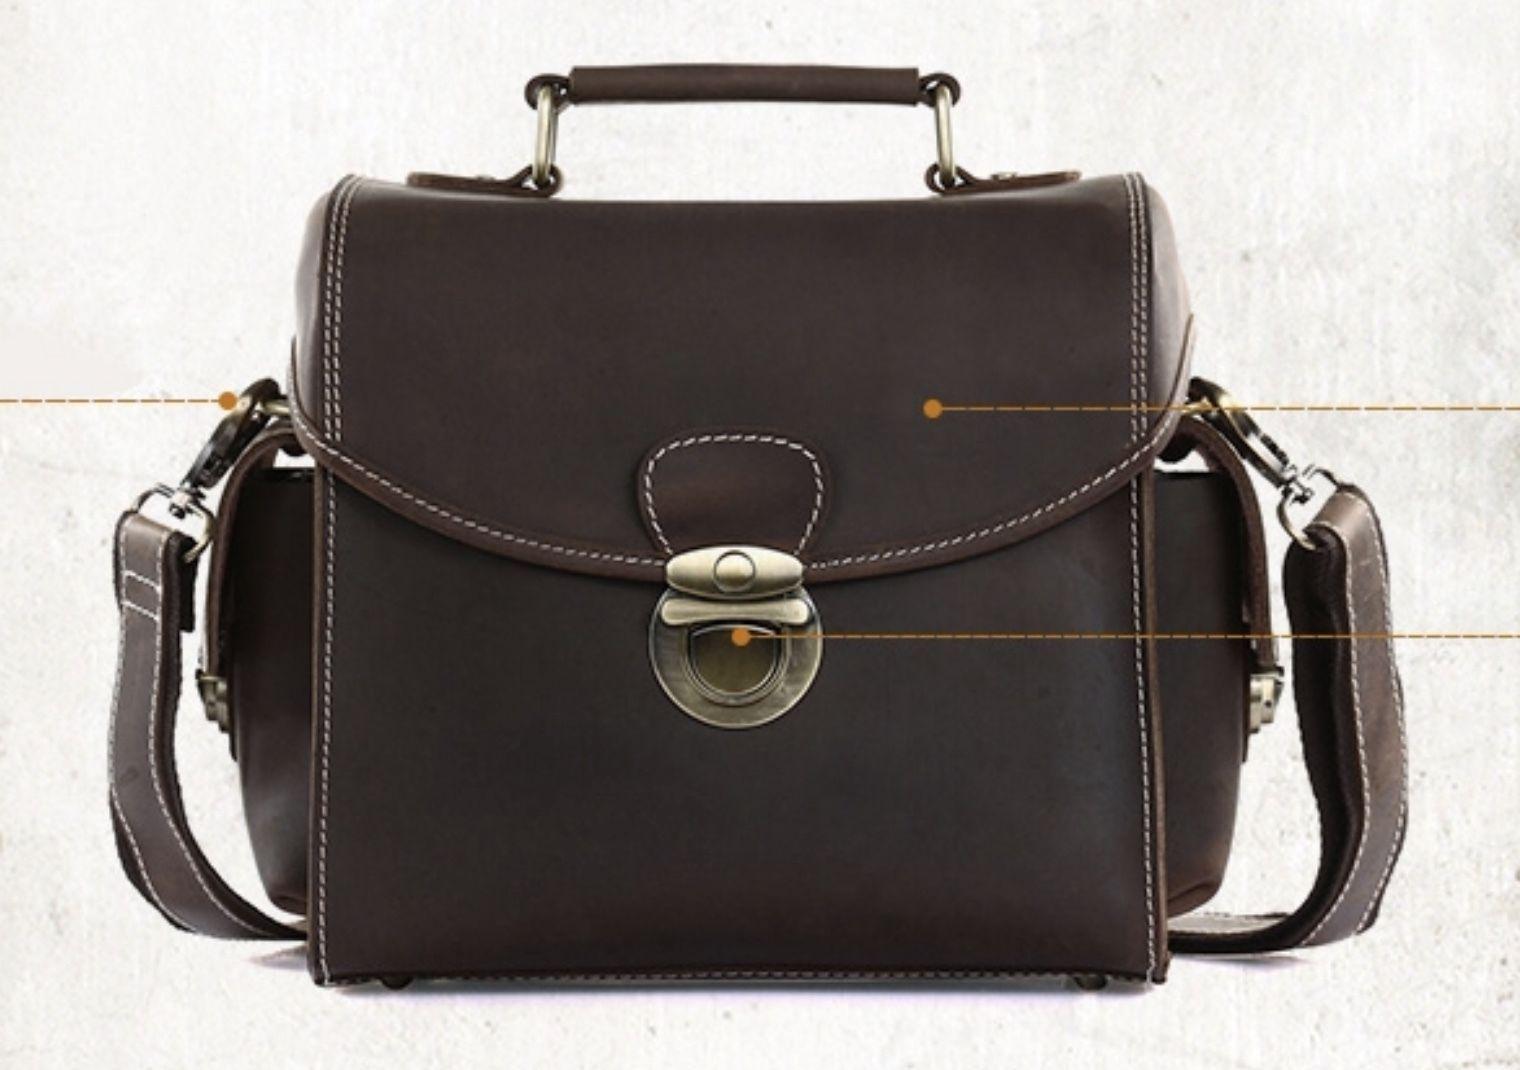 Pull up Crazy Horse Italian Leather Camera Case Bag Top Handle Shoulder Bag 1225